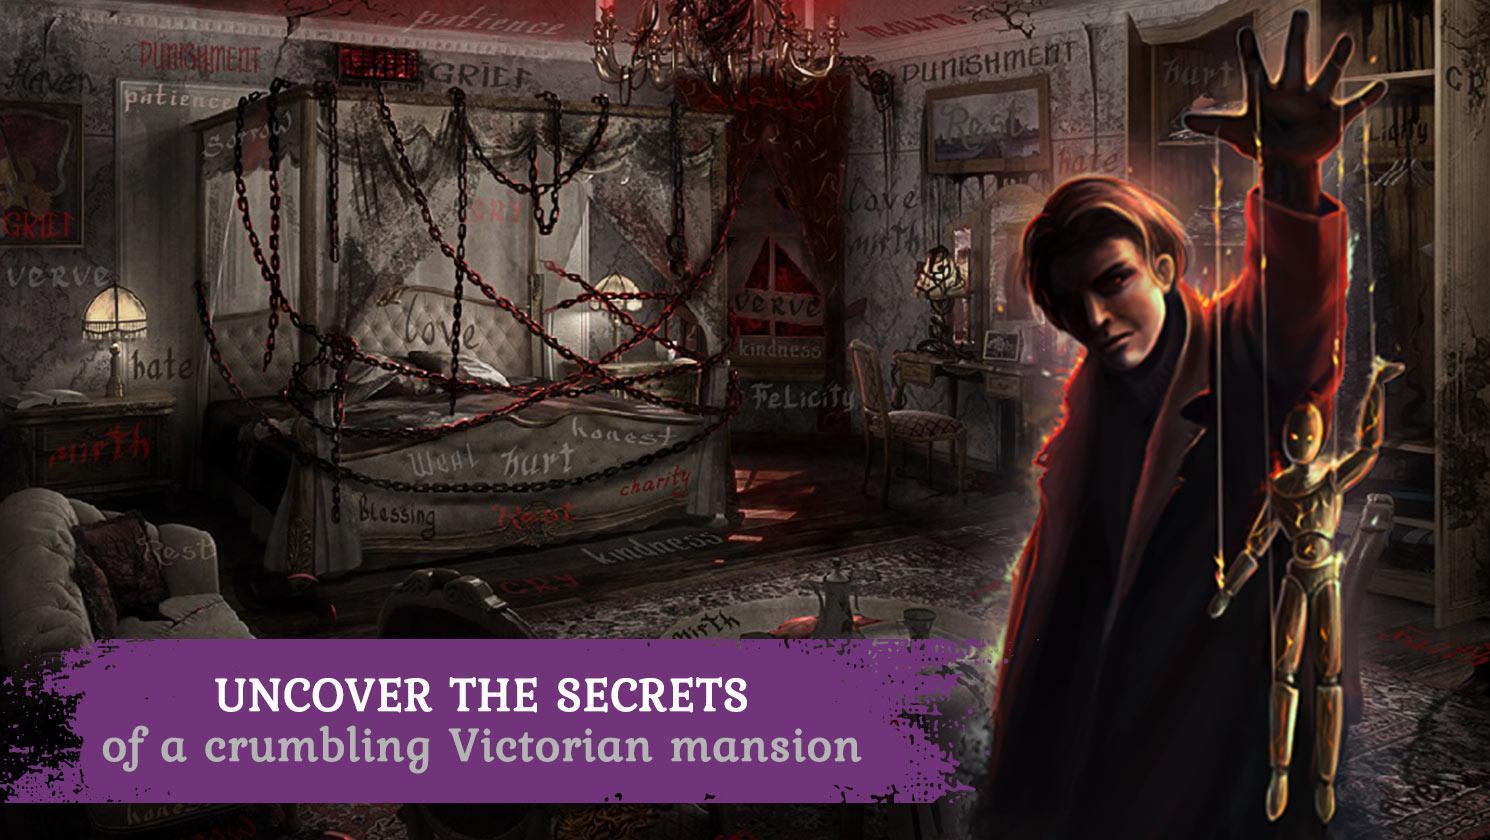 Panic Room | House of secrets 1.4.3 Screenshot 6